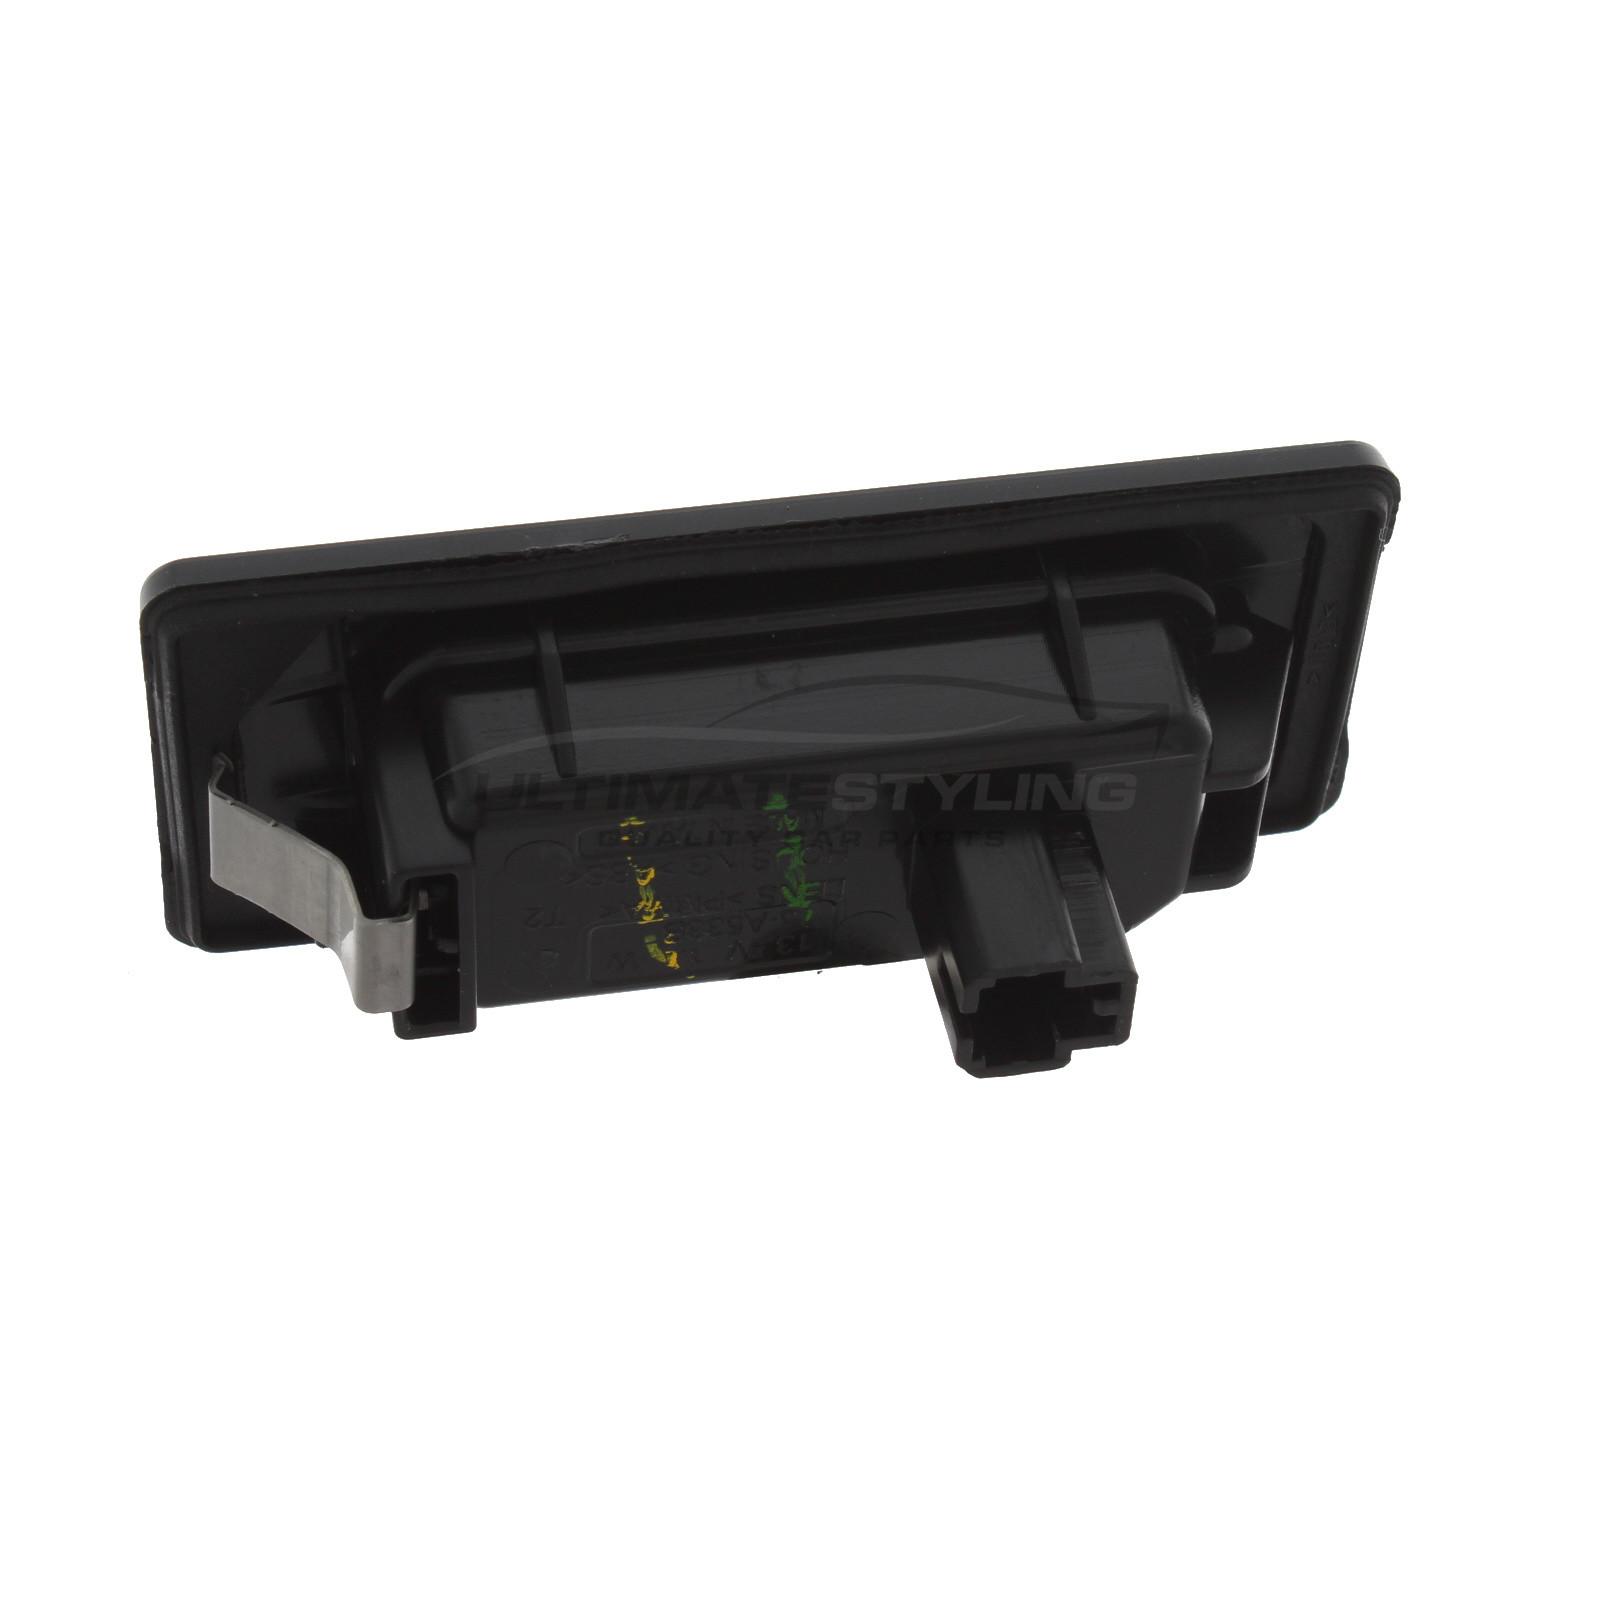 Rear Number Plate Light - Universal (LH or RH) for Audi A1 / A3 / A4 / A6 / A7 / Q3 / Q7 / RS3 / RS4 / RS6 / RS7 / RSQ3 / S1 / S3 / S4 / S6 / S7 / SQ7, Seat Alhambra / Arona / Ateca, Skoda Fabia / Karoq / Kodiaq / Octavia / Rapid / Superb / Yeti, Volkswagen Caddy / Caravelle and others